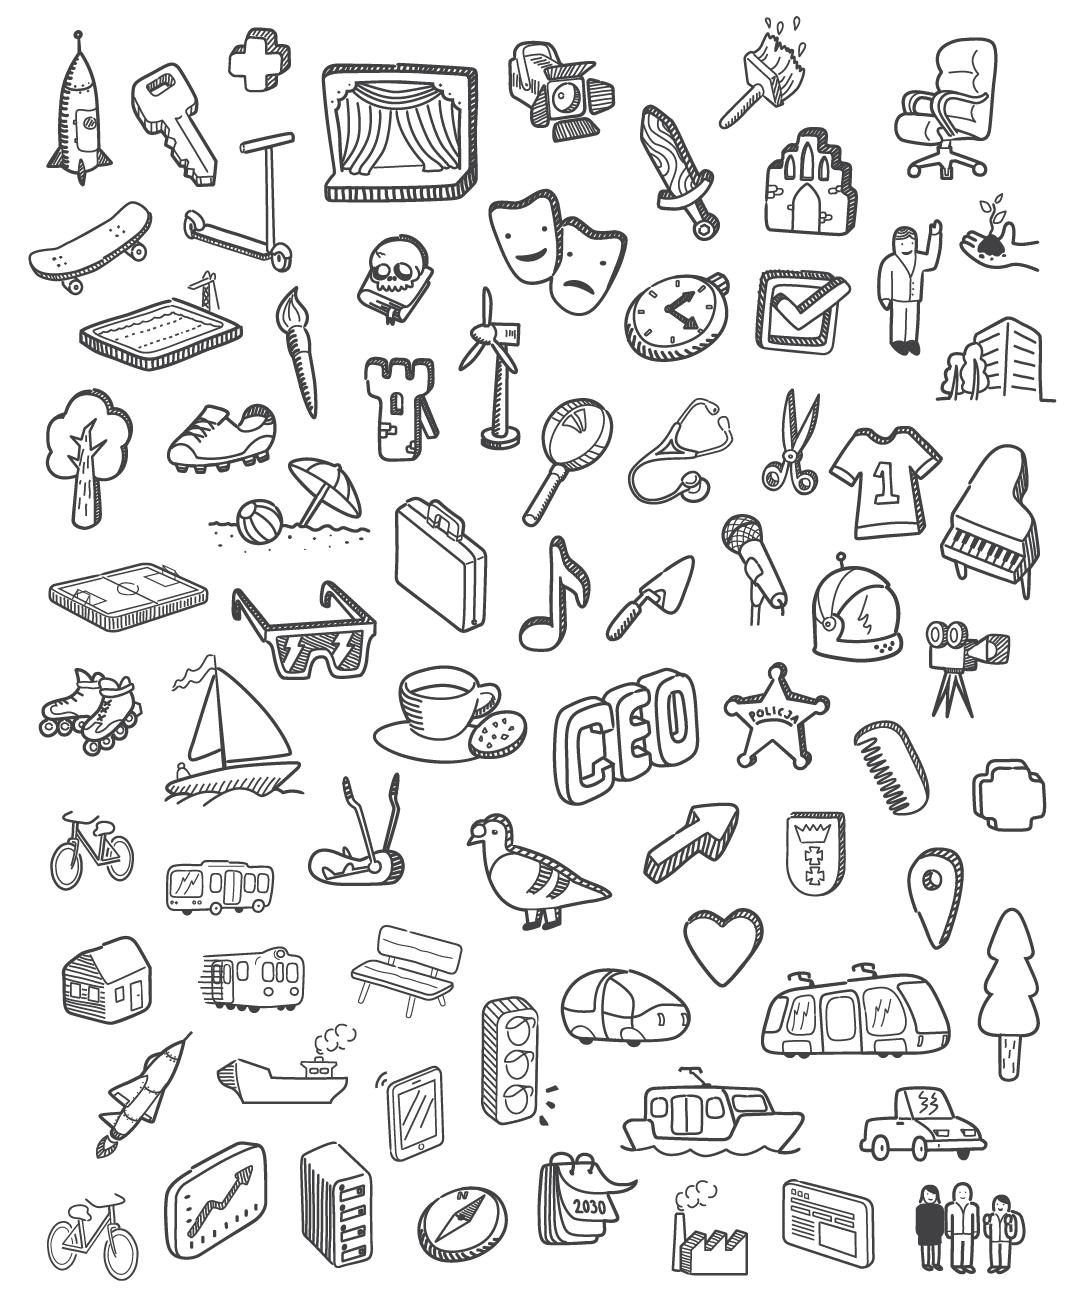 Gdansk 2030 Plus Doodle Art Doodle Art Journals Doodle Art For Beginners